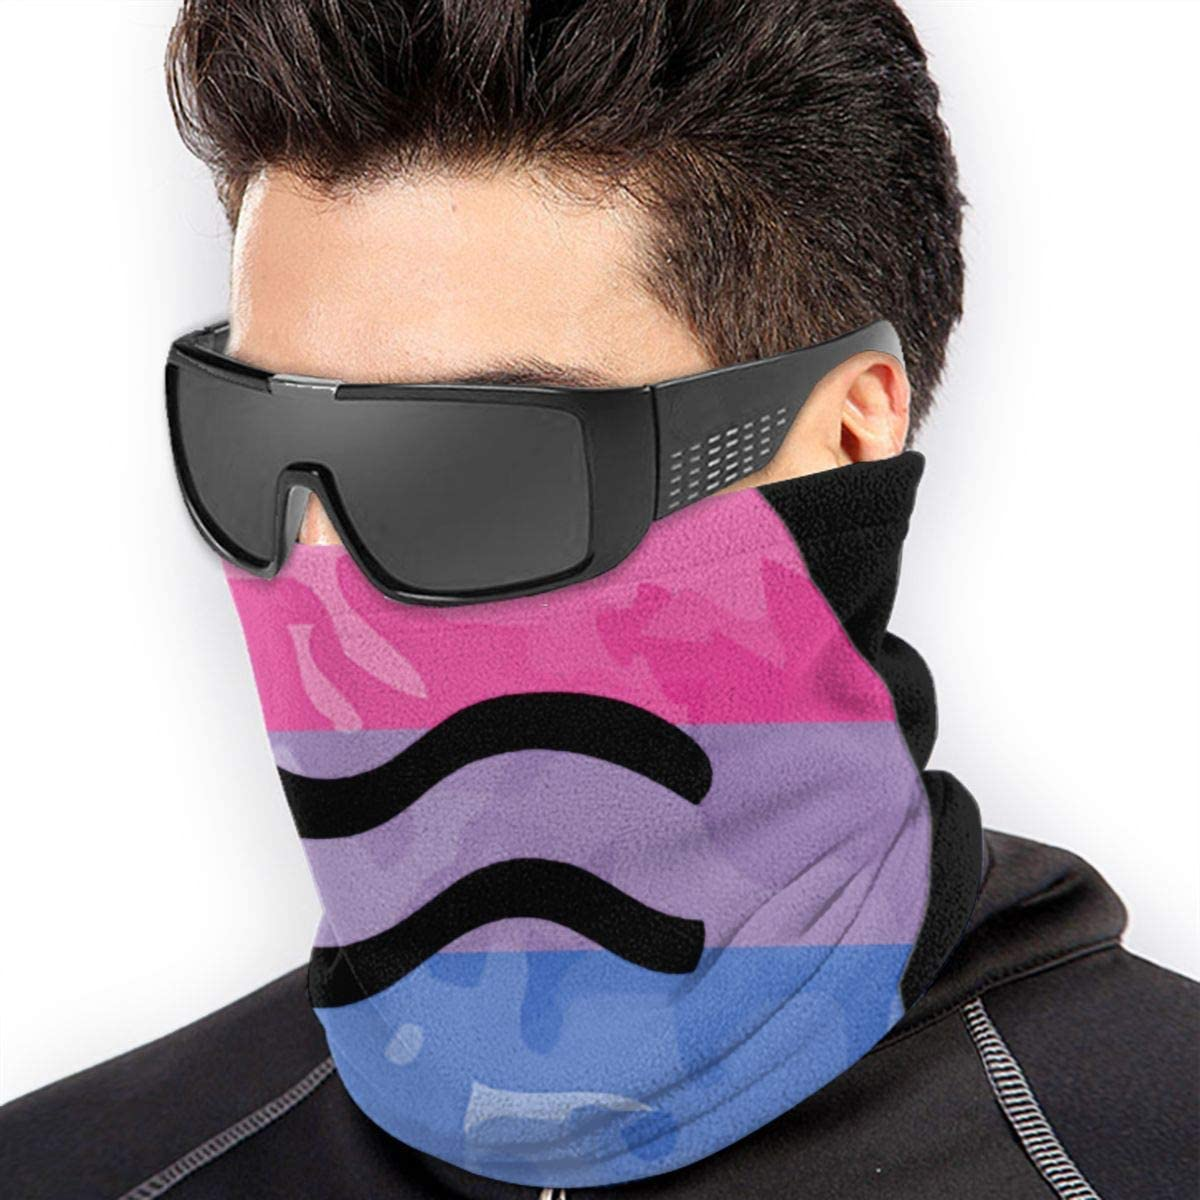 WlQshop Pride Aquarius Sign Tour de Cou Cagoules Bandana Cache Cou for Men Women Sun UV Wind Dust Protection Skiing Riding Running